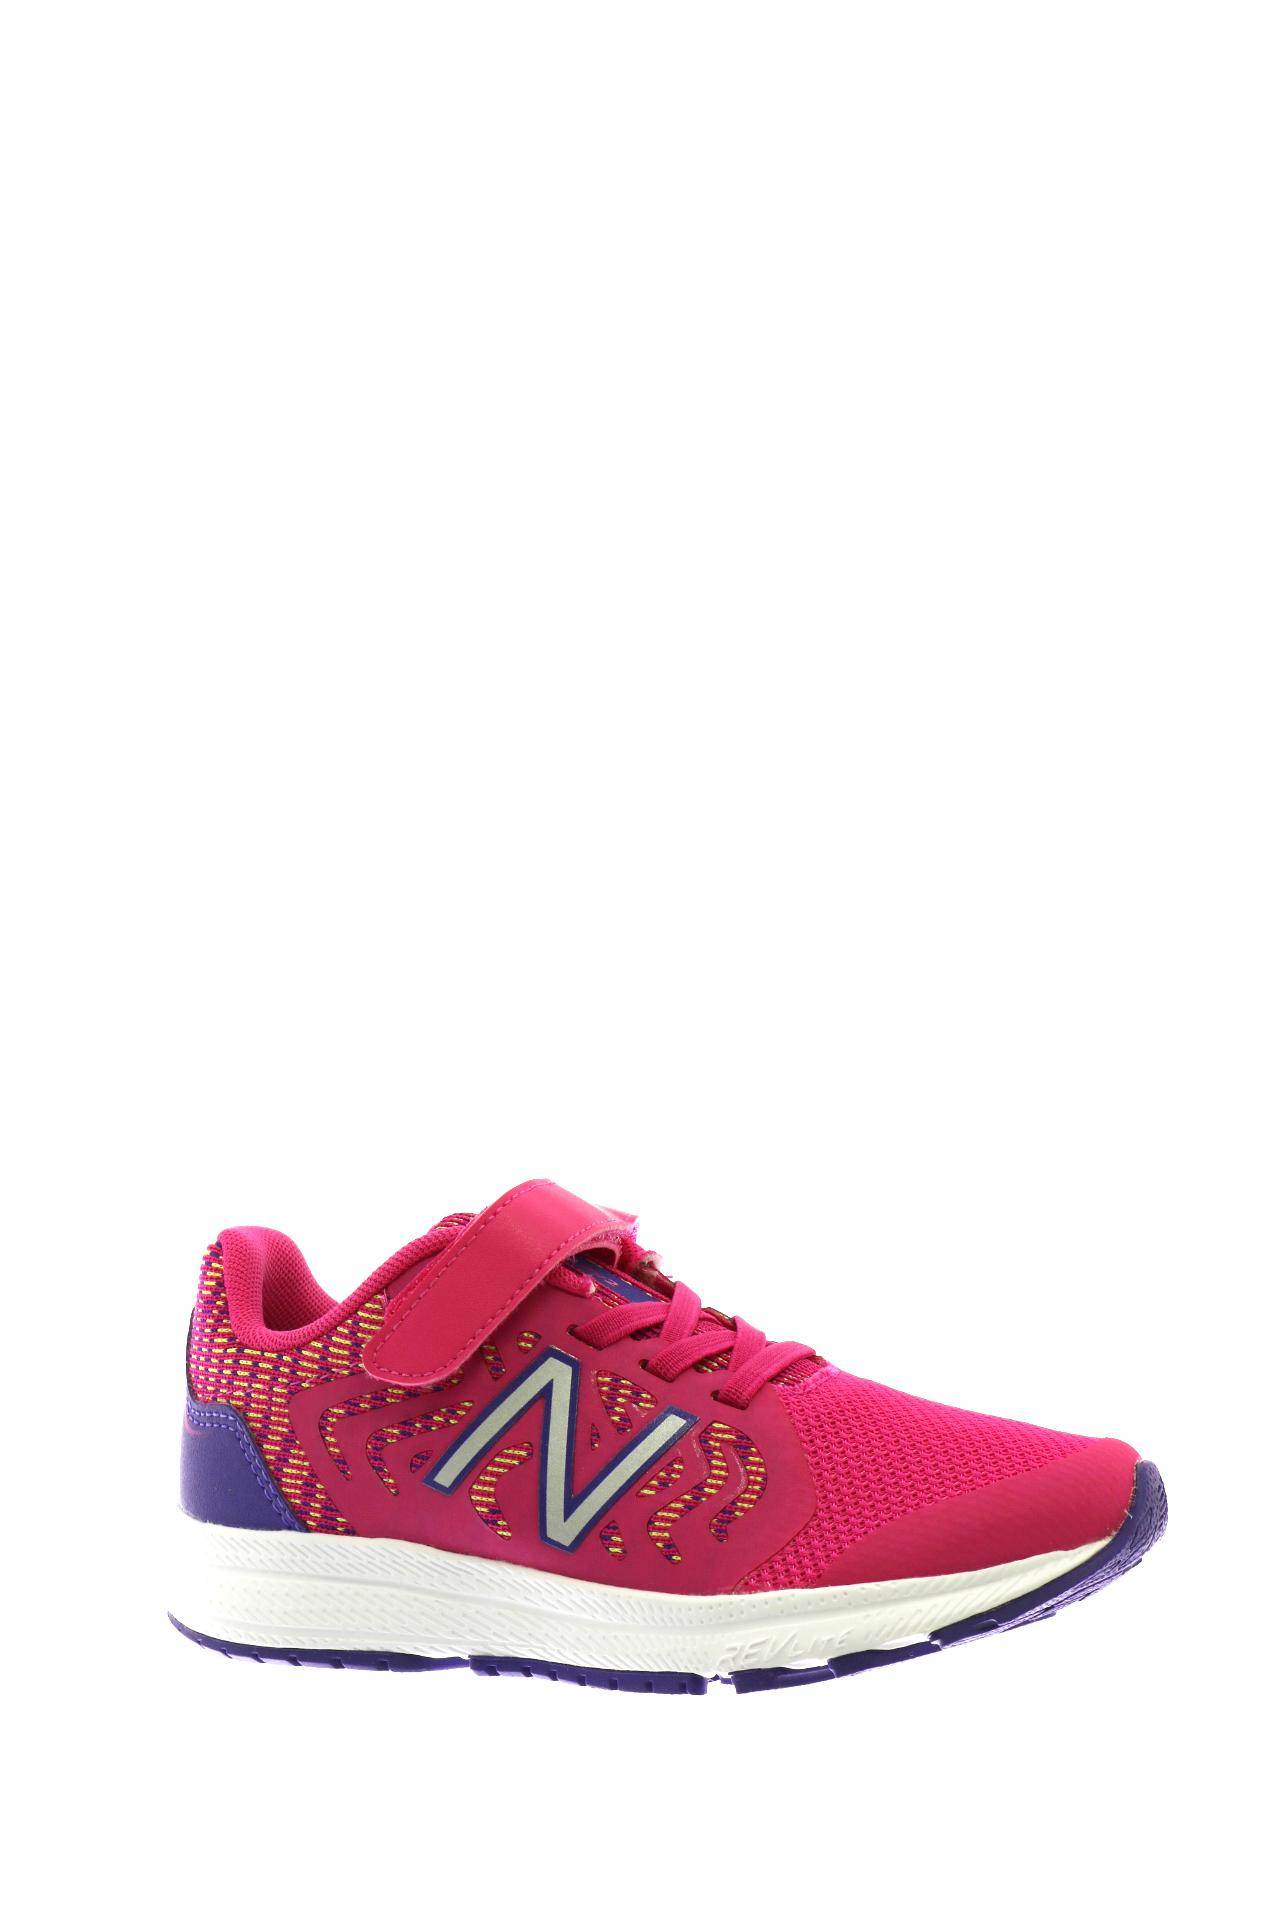 New Balance 519V2